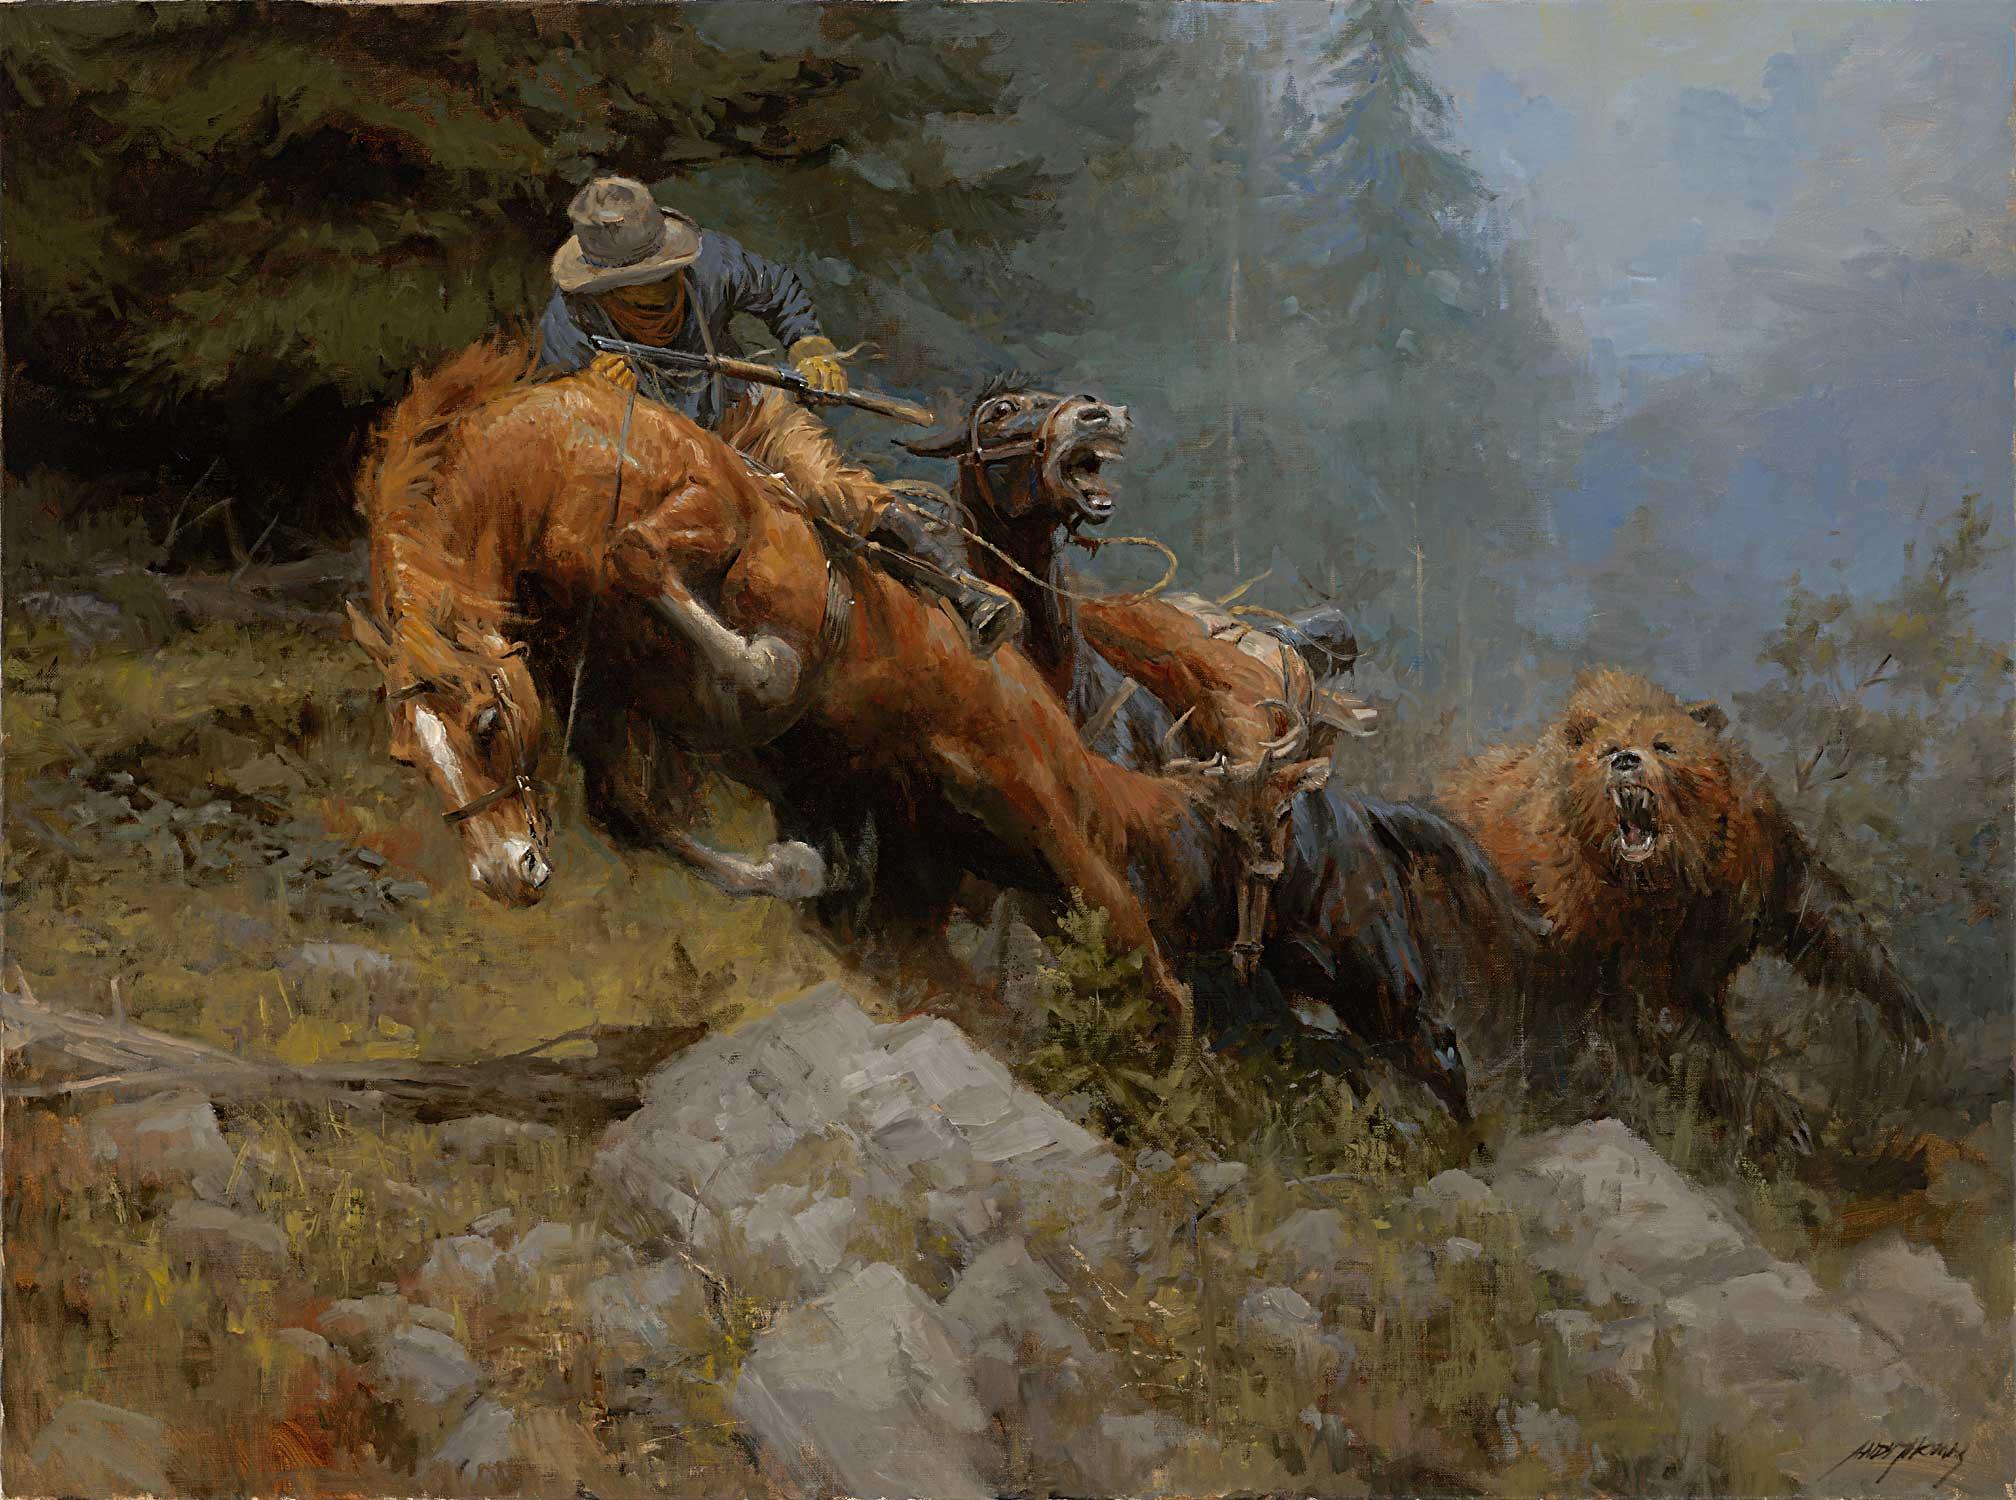 Wild West Painting Wallpaper 16645   Wallpaperesque 2016x1500